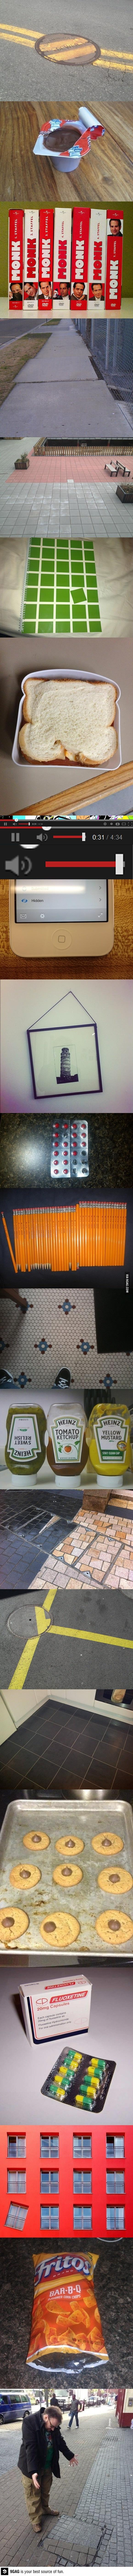 My OCD senses are tingling...